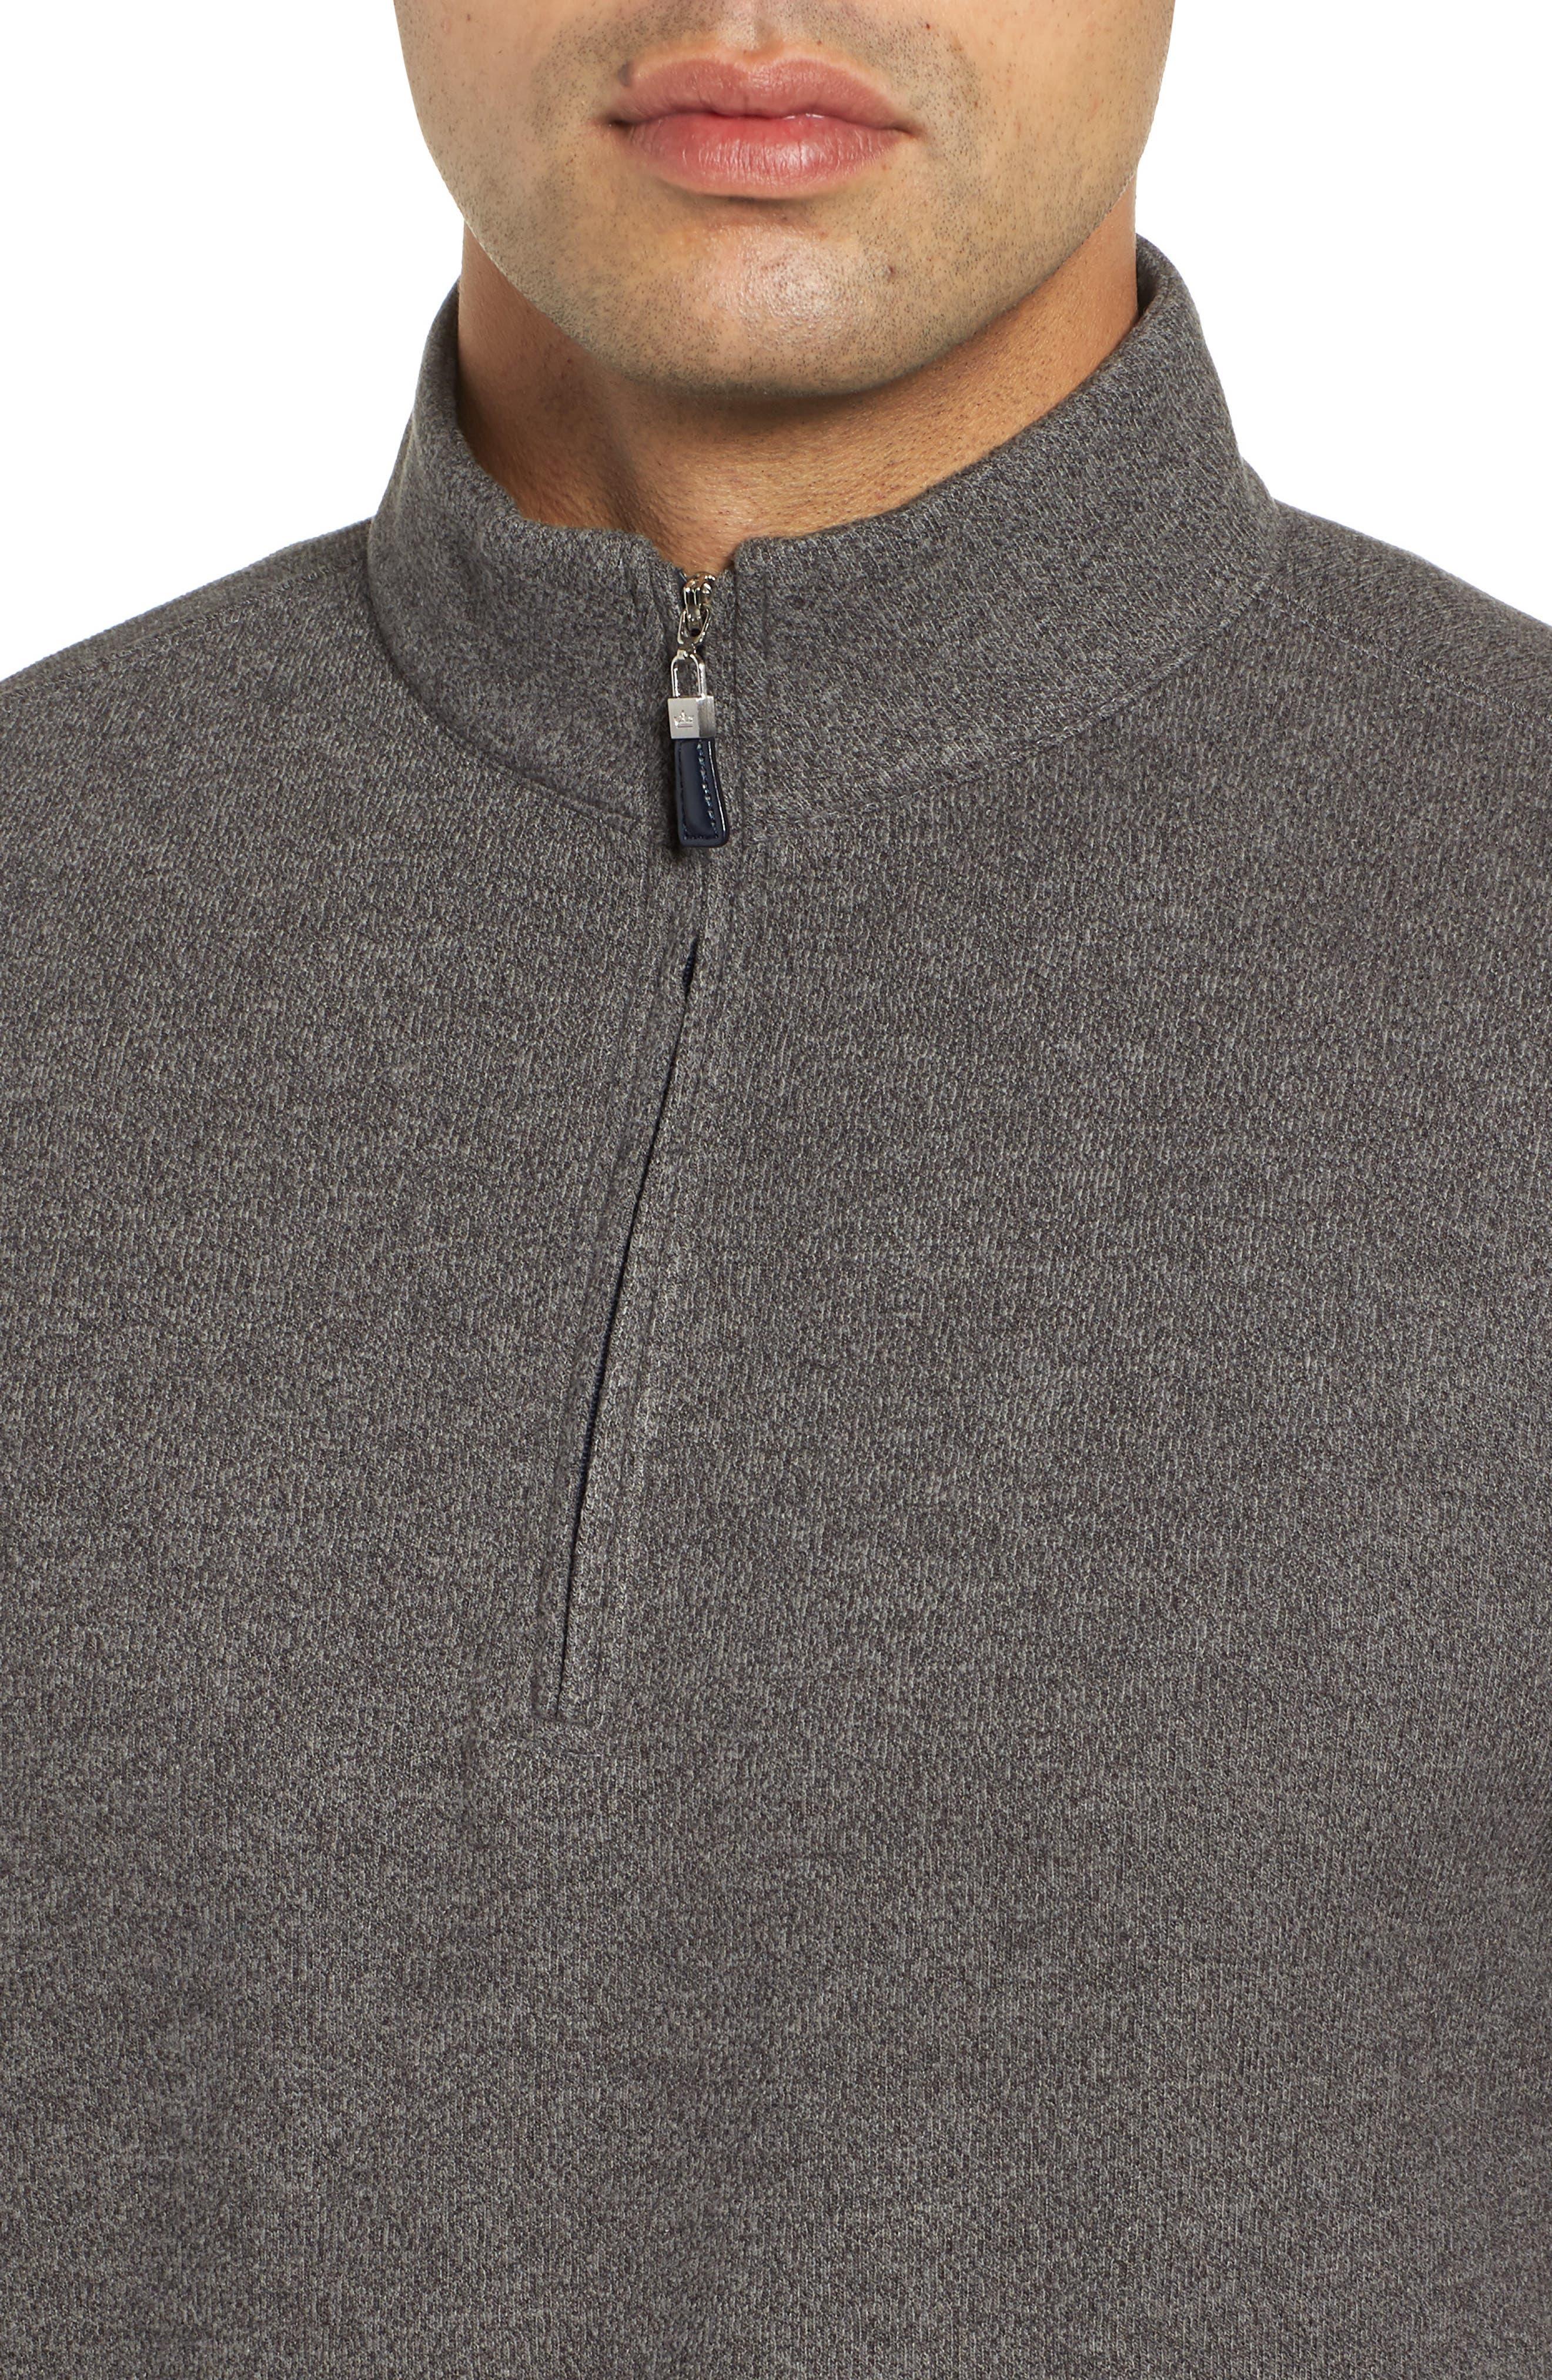 Mélange Fleece Quarter Zip Pullover,                             Alternate thumbnail 4, color,                             SMOKE